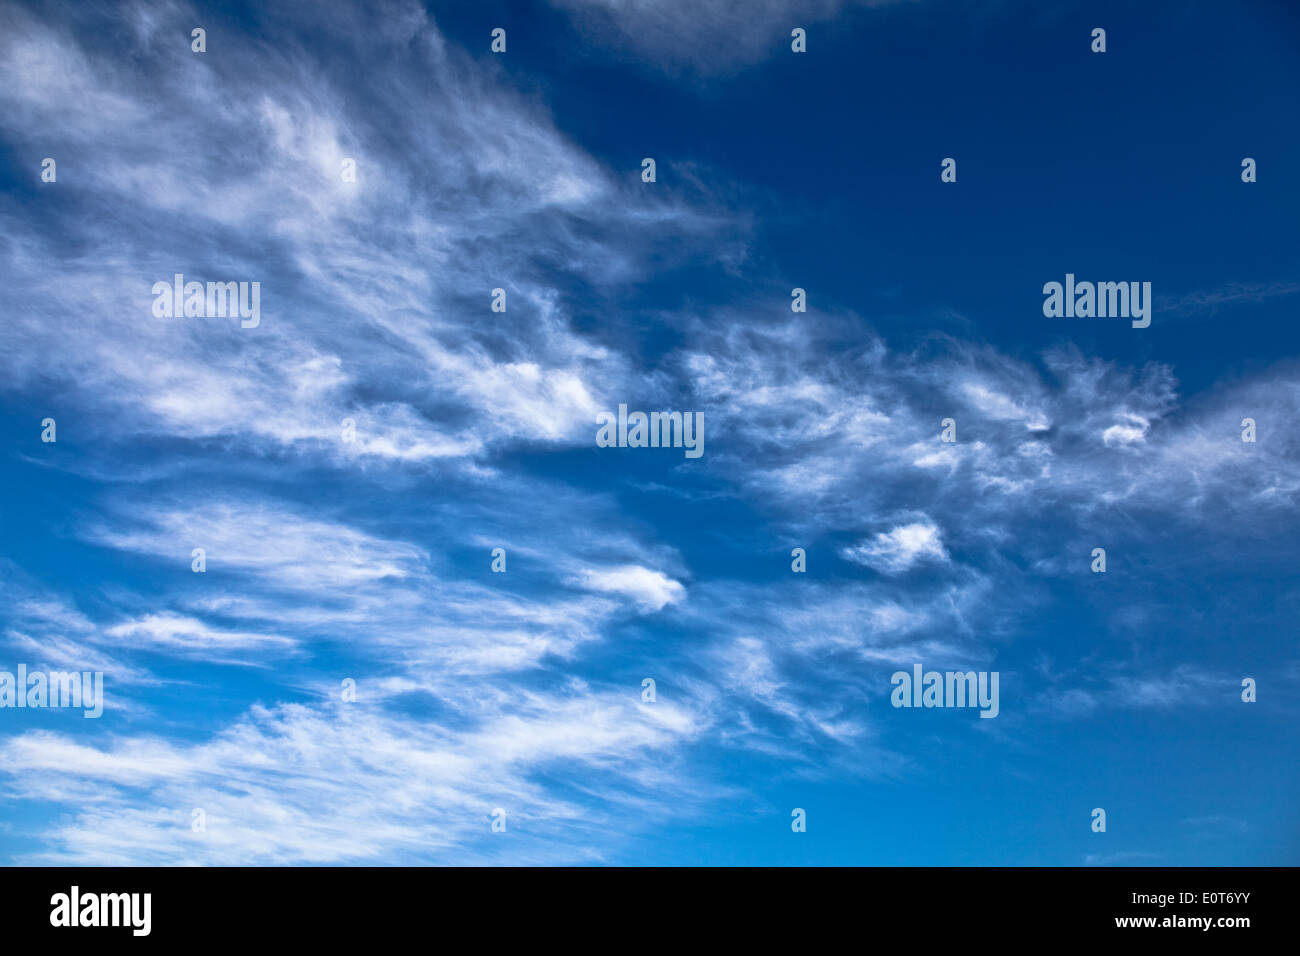 Wolken bin Himmel - Wolken am Himmel Stockbild